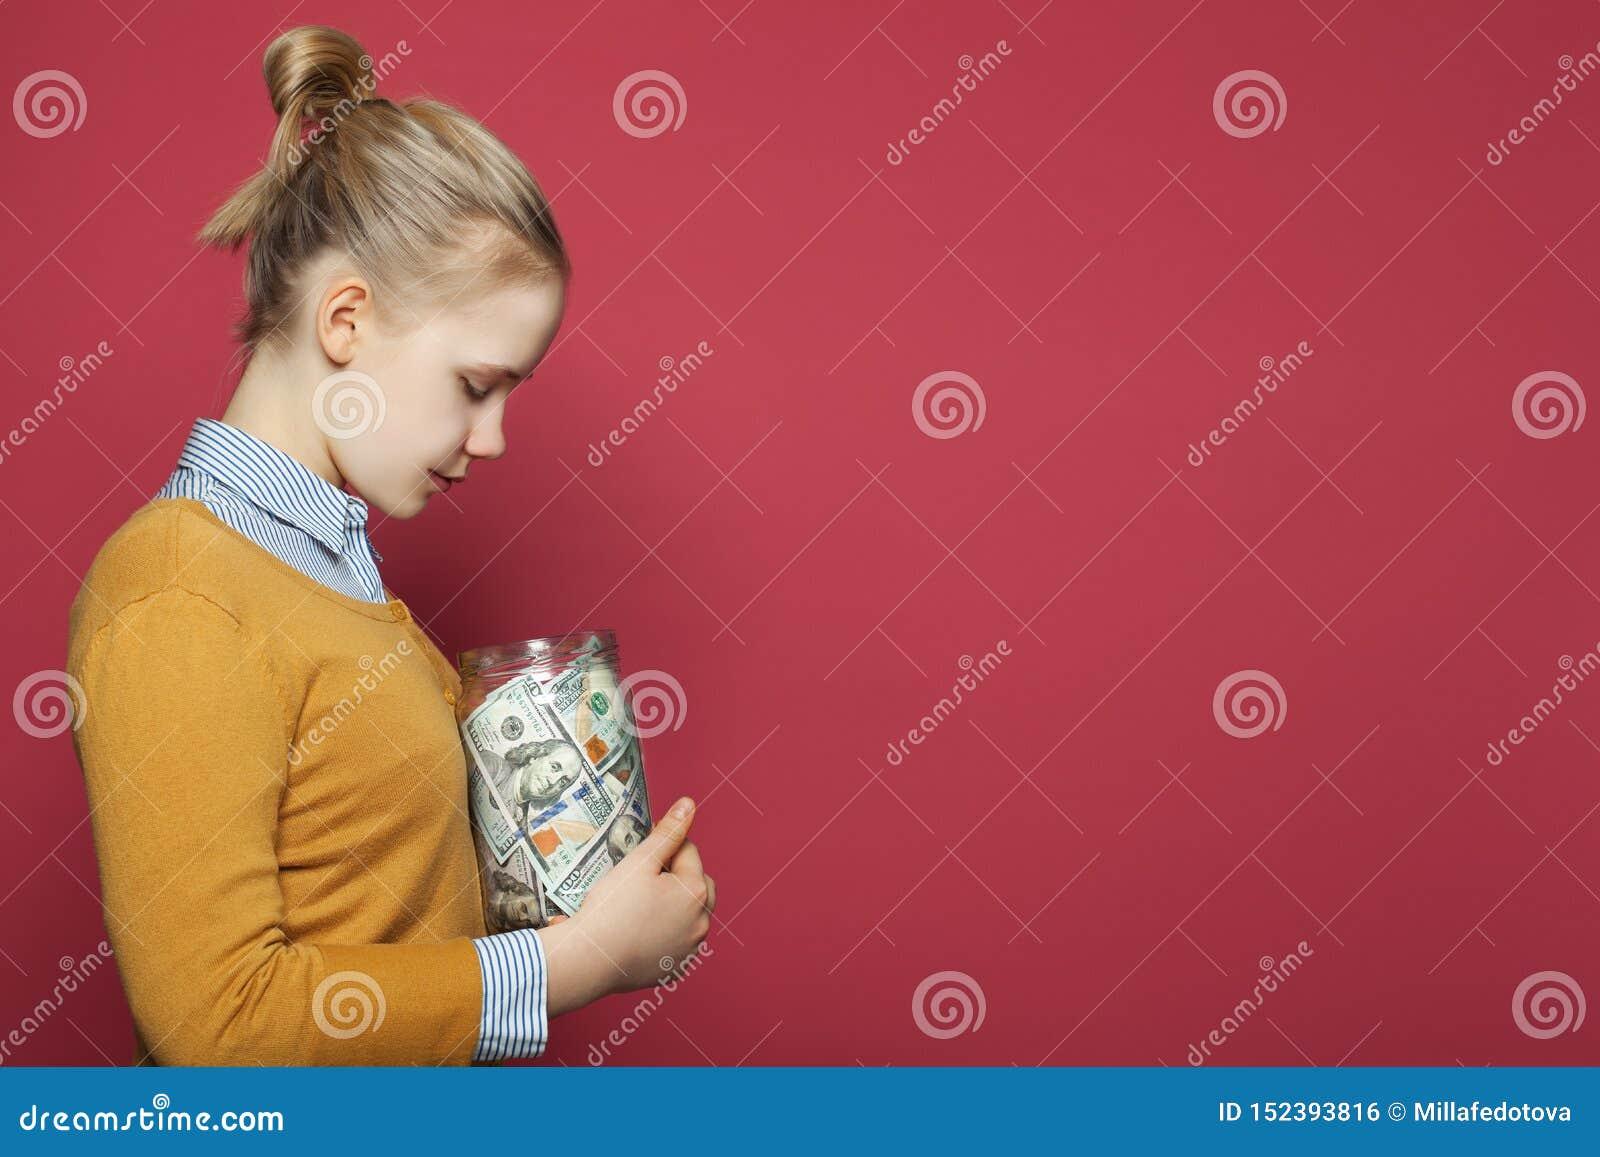 Saving money concept. Pretty young girl holding money cash